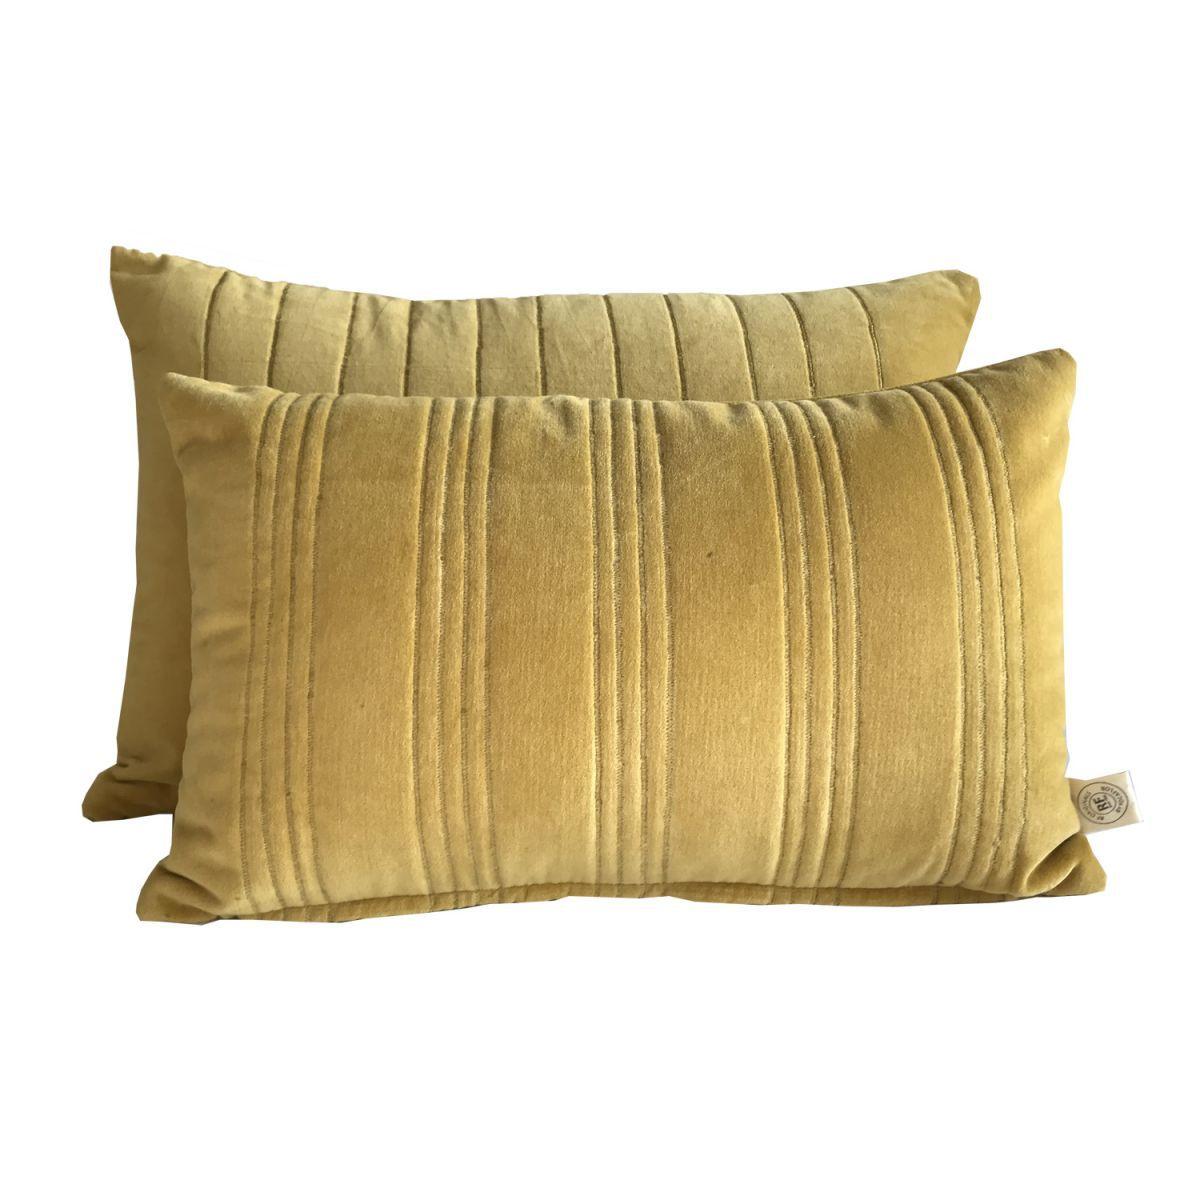 cushion velvet ocher yellow with gold stitching 50x30cm